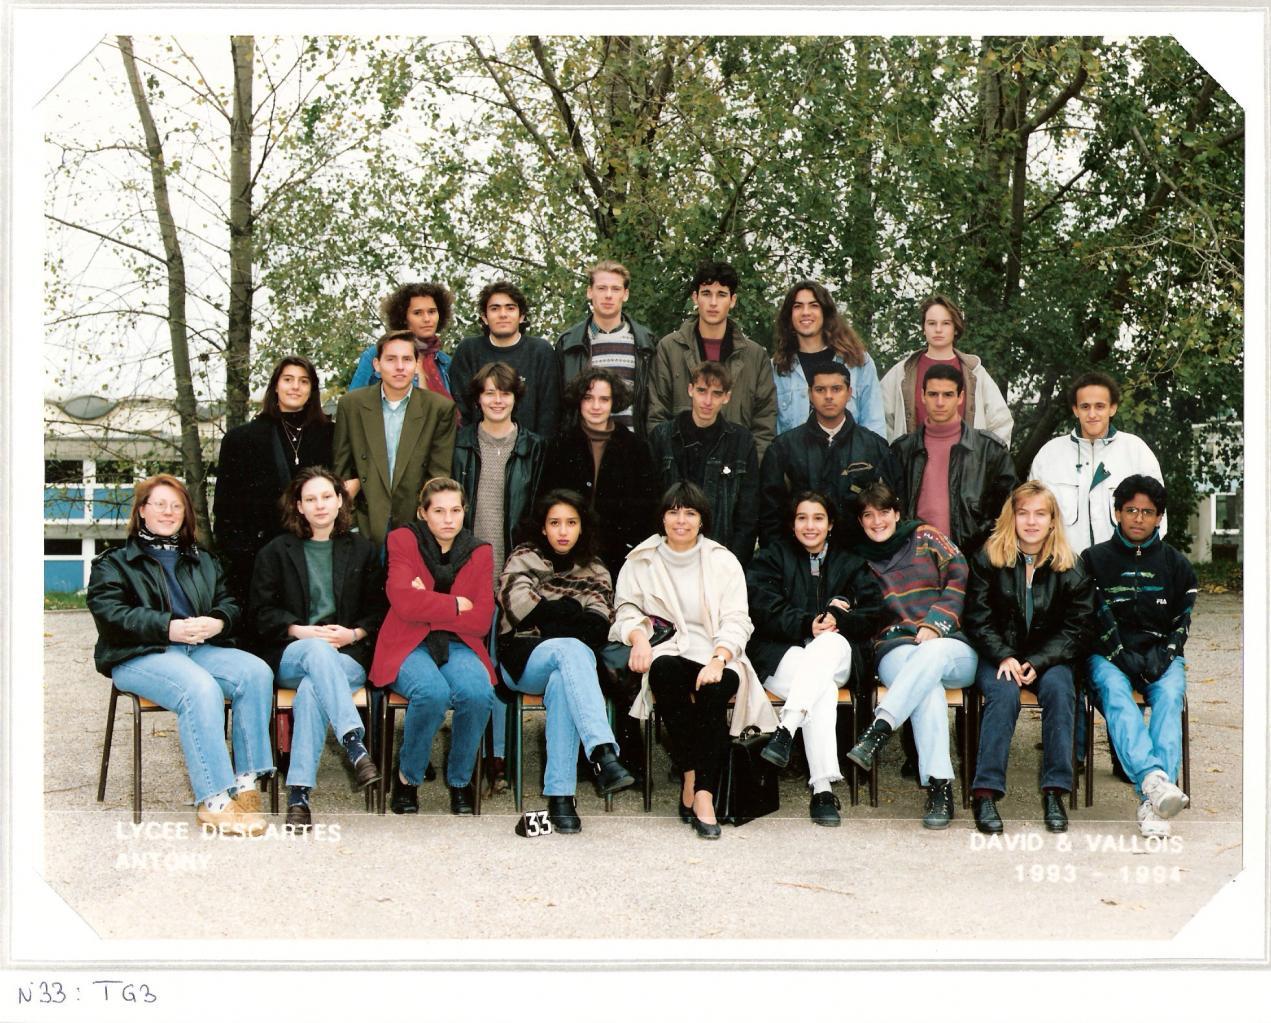 1994 - TG3